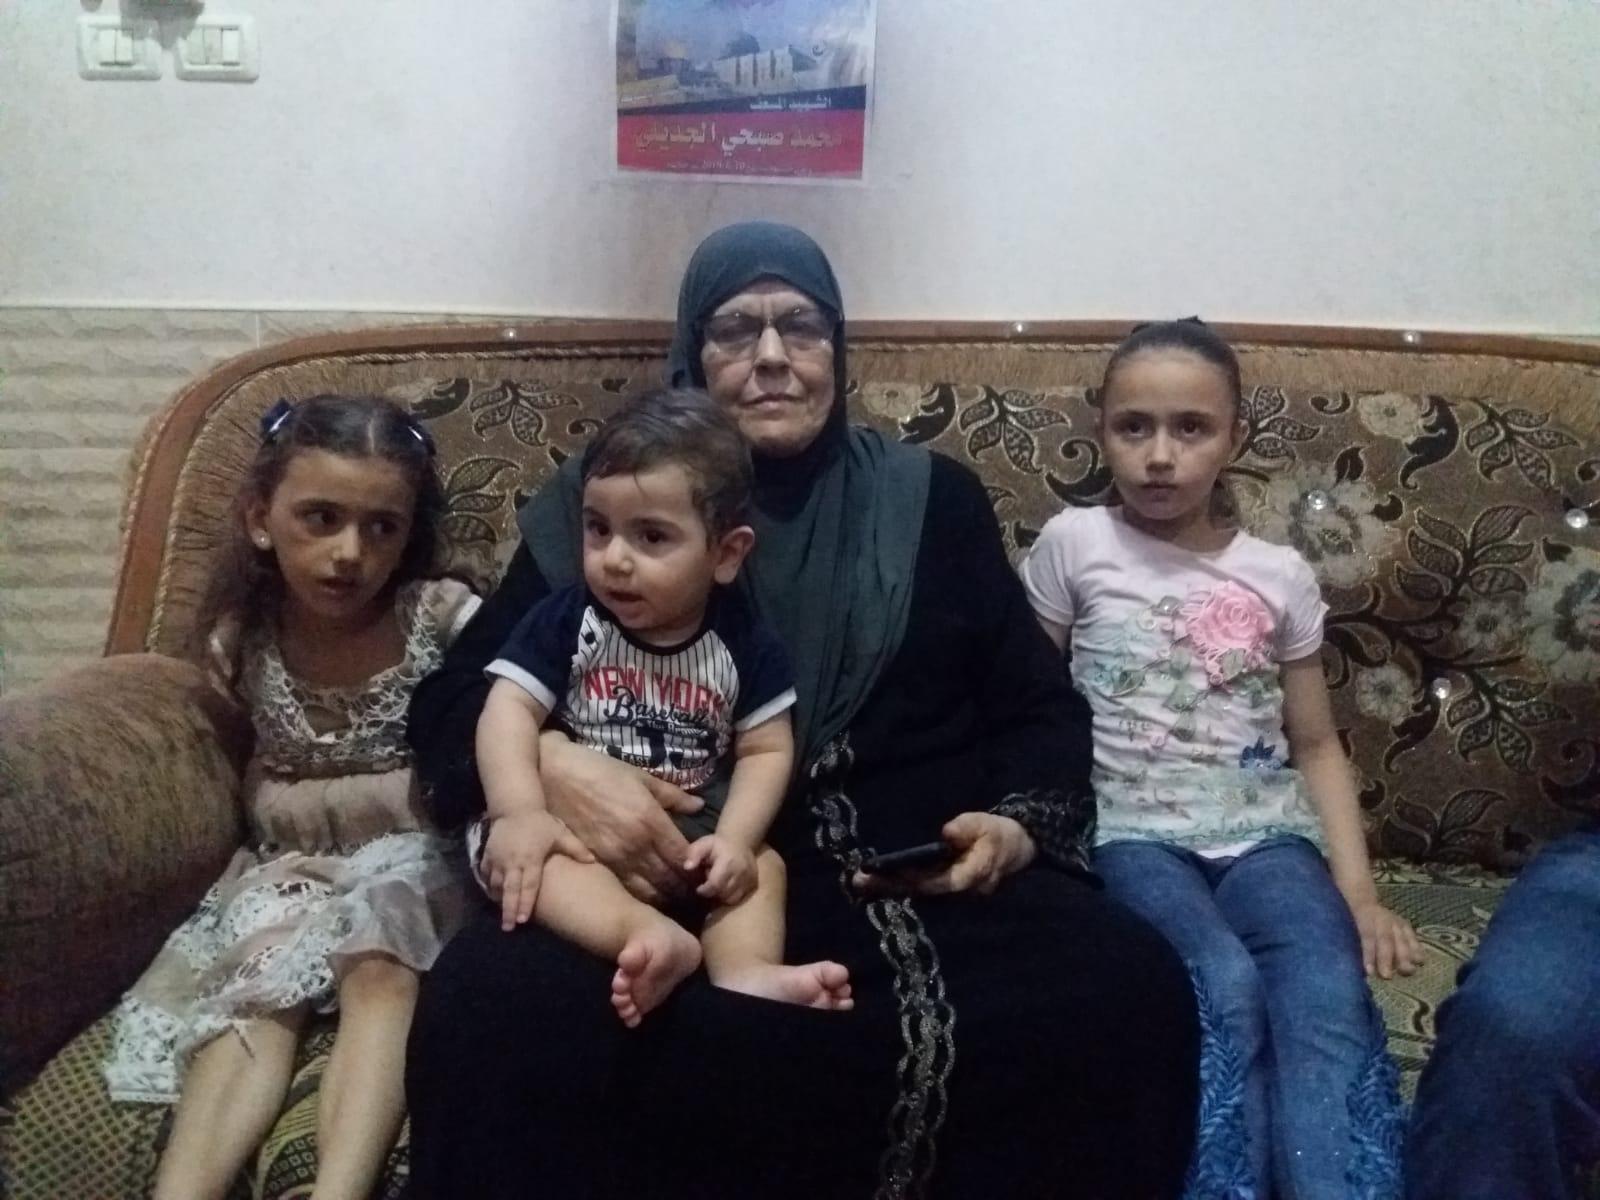 Kifaya Aljadeely, Mohammad's mother, along with Mohammad's children. (Photo: Rami Almeghari)